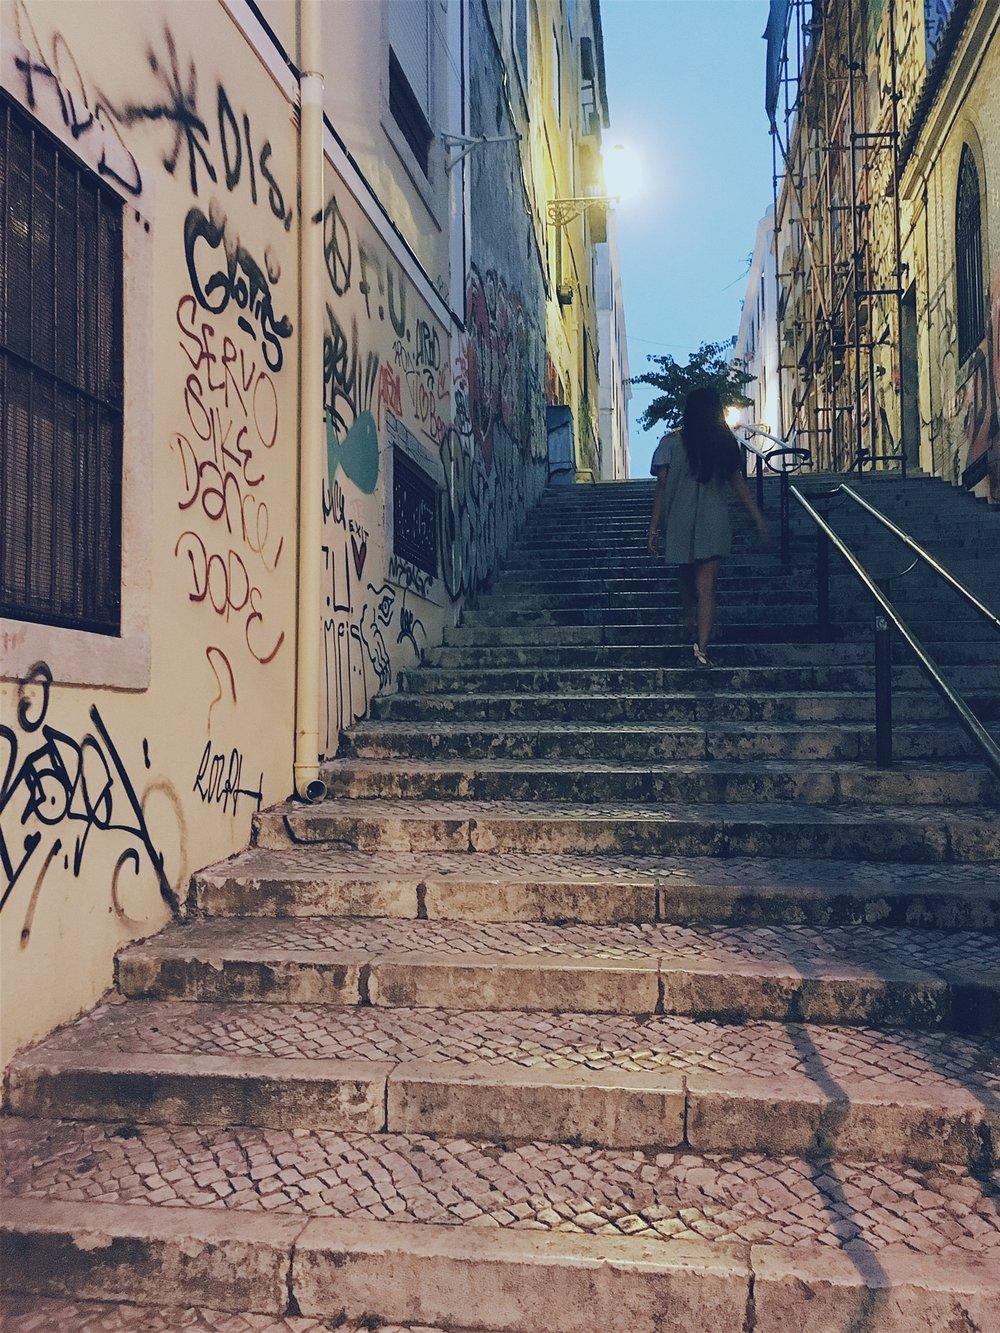 Graffiti and street art everywhere